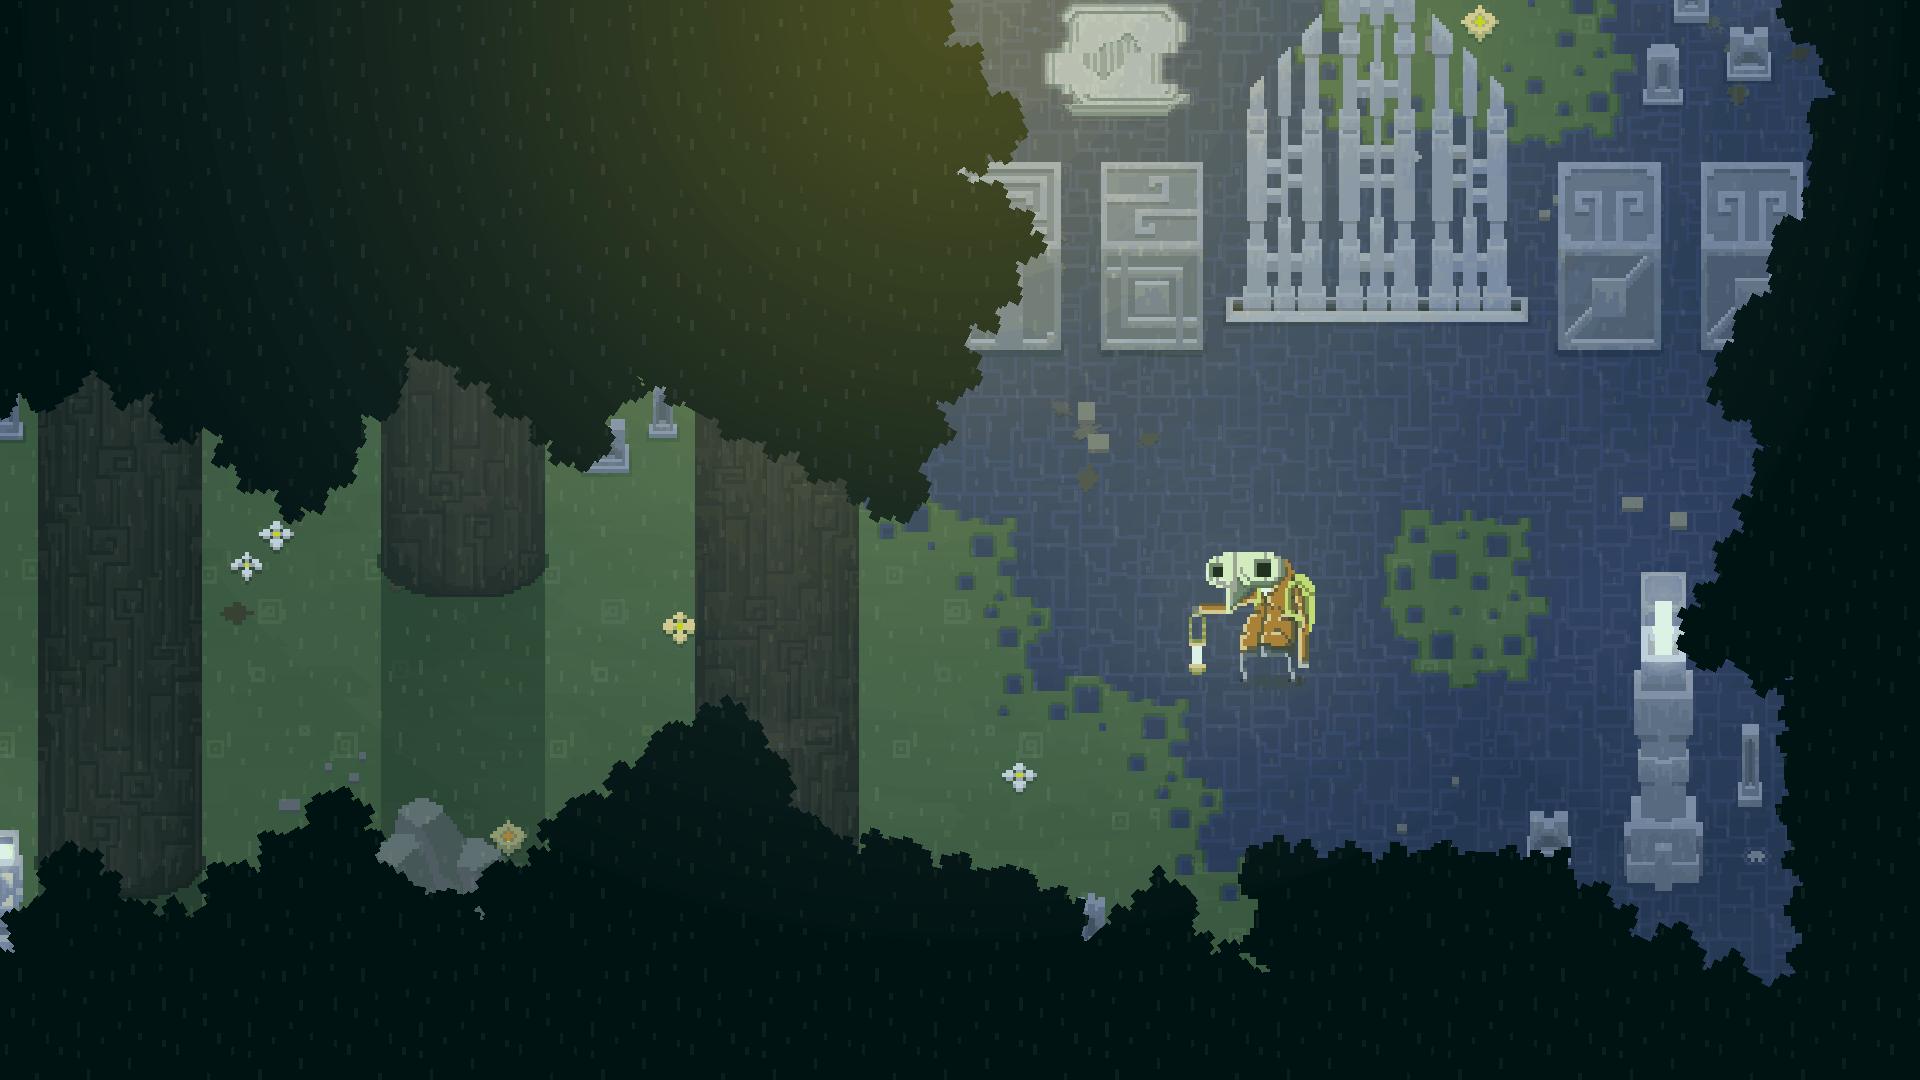 Moonrise Fall game screenshot